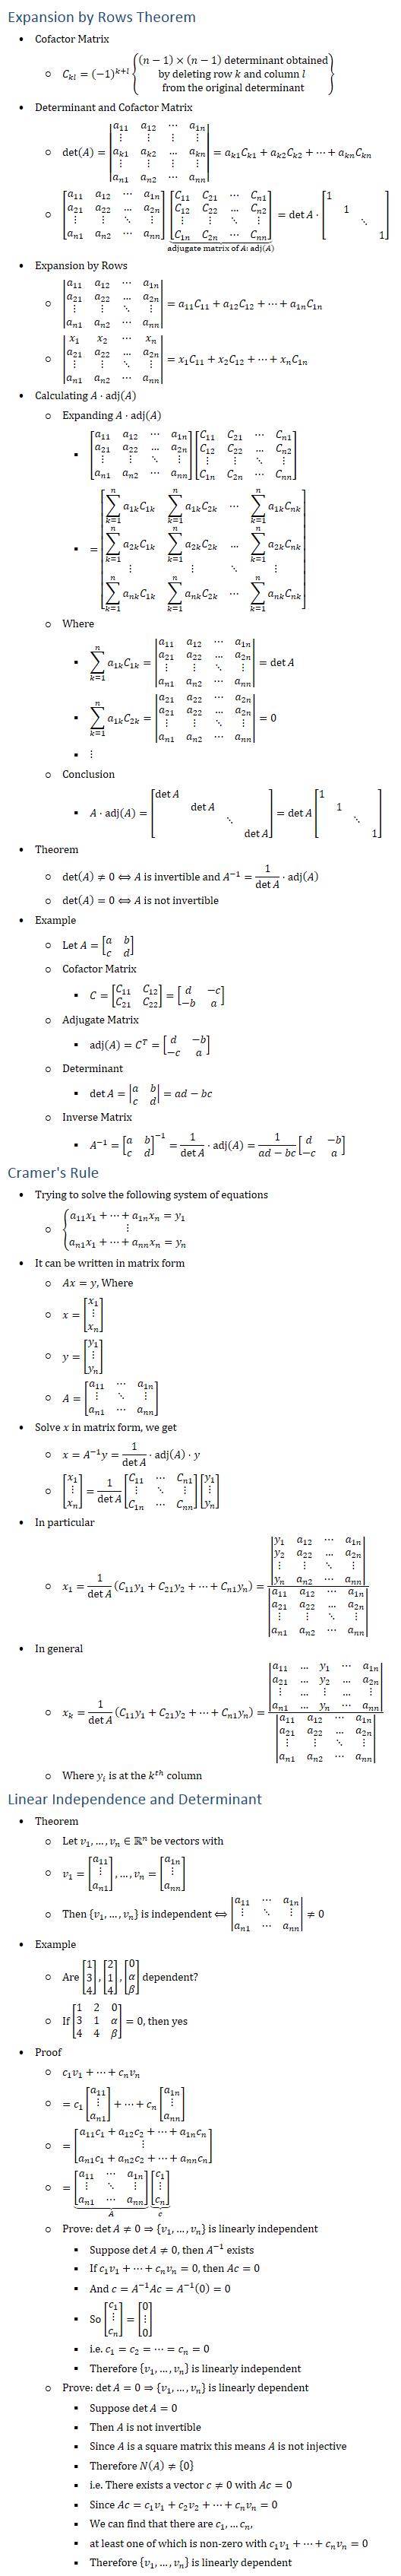 Expansion by Rows Theorem • Cofactor Matrix ○ C_kl=(−1)^(k+l) {█((n−1)×(n−1) determinant obtained@by deleting row k and column l @from the original determinant)} • Determinant and Cofactor Matrix ○ det(A)=|■8(a_11&a_12&⋯&a_1n@⋮&⋮&⋮&⋮@a_k1&a_k2&…&a_kn@⋮&⋮&⋮&⋮@a_n1&a_n2&⋯&a_nn )|=a_k1 C_k1+a_k2 C_k2+…+a_kn C_kn ○ [■8(a_11&a_12&⋯&a_1n@a_21&a_22&…&a_2n@⋮&⋮&⋱&⋮@a_n1&a_n2&⋯&a_nn )] ⏟([■8(C_11&C_21&⋯&C_n1@C_12&C_22&…&C_n2@⋮&⋮&⋱&⋮@C_1n&C_2n&⋯&C_nn )] )┬(adjugate matrix of A: adj(A))=detA⋅[■(1&&&@&1&&@&&⋱&@&&&1)] • Expansion by Rows ○ |■8(a_11&a_12&⋯&a_1n@a_21&a_22&…&a_2n@⋮&⋮&⋱&⋮@a_n1&a_n2&⋯&a_nn )|=a_11 C_11+a_12 C_12+…+a_1n C_1n ○ |■8(x_1&x_2&⋯&x_n@a_21&a_22&…&a_2n@⋮&⋮&⋱&⋮@a_n1&a_n2&⋯&a_nn )|=x_1 C_11+x_2 C_12+…+x_n C_1n • Calculating A⋅adj(A) ○ Expanding A⋅adj(A) § [■8(a_11&a_12&⋯&a_1n@a_21&a_22&…&a_2n@⋮&⋮&⋱&⋮@a_n1&a_n2&⋯&a_nn )][■8(C_11&C_21&⋯&C_n1@C_12&C_22&…&C_n2@⋮&⋮&⋱&⋮@C_1n&C_2n&⋯&C_nn )] § =[■8(∑_(k=1)^n▒〖a_1k C_1k 〗&∑_(k=1)^n▒〖a_1k C_2k 〗&⋯&∑_(k=1)^n▒〖a_1k C_nk 〗@∑_(k=1)^n▒〖a_2k C_1k 〗&∑_(k=1)^n▒〖a_2k C_2k 〗&…&∑_(k=1)^n▒〖a_2k C_nk 〗@⋮&⋮&⋱&⋮@∑_(k=1)^n▒〖a_nk C_1k 〗&∑_(k=1)^n▒〖a_nk C_2k 〗&⋯&∑_(k=1)^n▒〖a_nk C_nk 〗)] ○ Where § ∑_(k=1)^n▒〖a_1k C_1k 〗=|■8(a_11&a_12&⋯&a_1n@a_21&a_22&…&a_2n@⋮&⋮&⋱&⋮@a_n1&a_n2&⋯&a_nn )|=detA § ∑_(k=1)^n▒〖a_1k C_2k 〗=|■8(a_21&a_22&⋯&a_2n@a_21&a_22&…&a_2n@⋮&⋮&⋱&⋮@a_n1&a_n2&⋯&a_nn )|=0 § ⋮ ○ Conclusion § A⋅adj(A)=[■(detA&&&@&detA&&@&&⋱&@&&&detA )]=detA [■(1&&&@&1&&@&&⋱&@&&&1)] • Theorem ○ det〖(A)≠0〗⟺A is invertible and A^(−1)=1/detA ⋅adj(A) ○ det(A)=0⟺A is not invertible • Example ○ Let A=[■8(a&b@c&d)] ○ Cofactor Matrix § C=[■8(C_11&C_12@C_21&C_22 )]=[■8(d&−c@−b&a)] ○ Adjugate Matrix § adj(A)=C^T=[■8(d&−b@−c&a)] ○ Determinant § detA=|■8(a&b@c&d)|=ad−bc ○ Inverse Matrix § A^(−1)=[■8(a&b@c&d)]^(−1)=1/detA ⋅adj(A)=1/(ad−bc) [■8(d&−b@−c&a)] Cramer